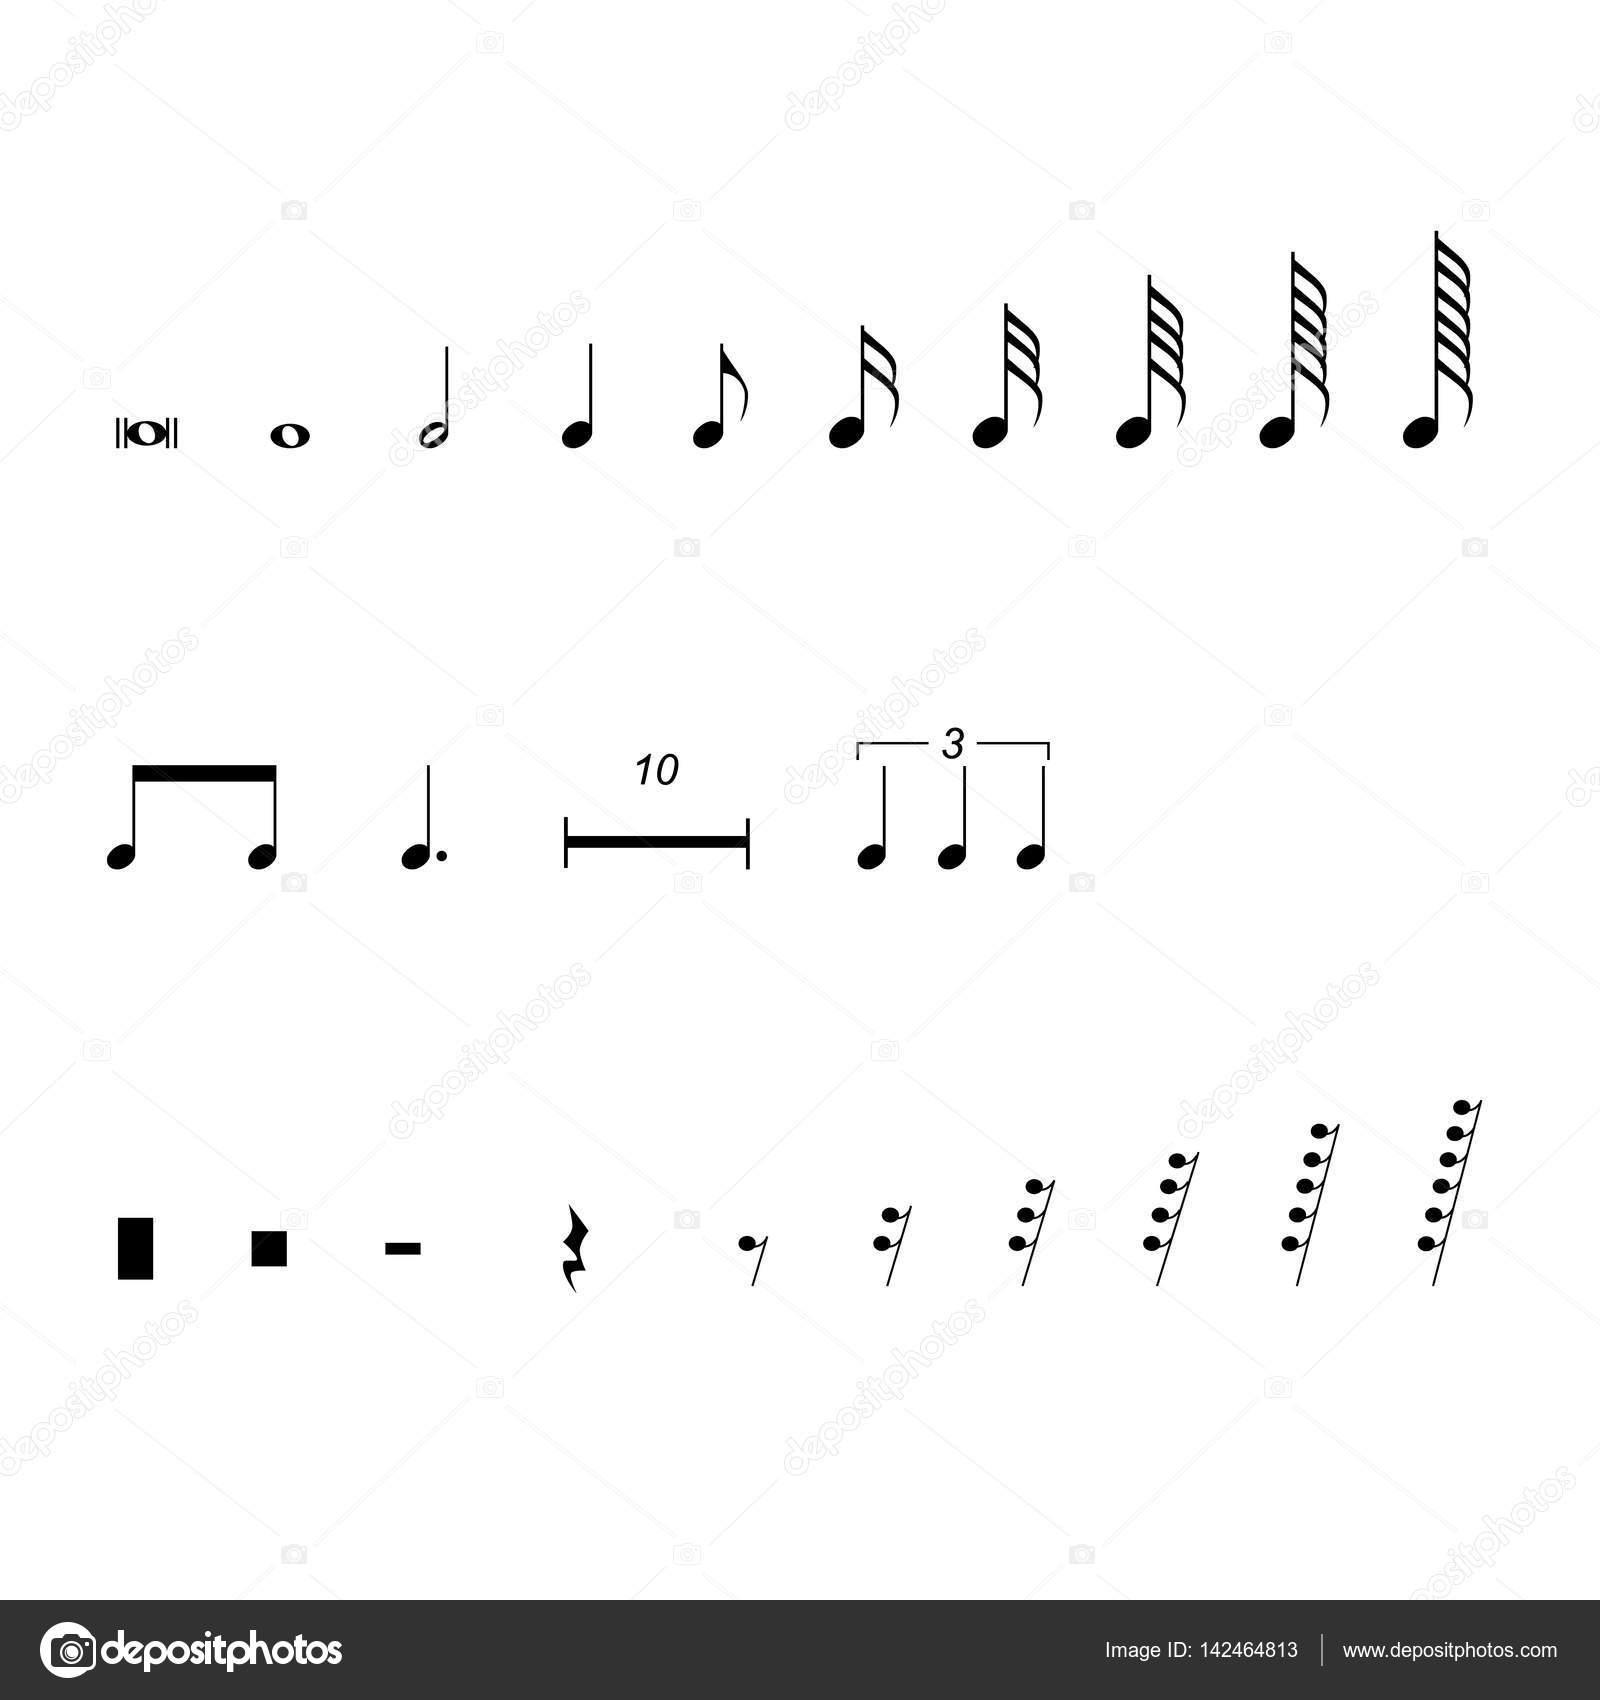 Musical notation symbols stock vector viktorijareut 142464813 musical notation symbols stock vector biocorpaavc